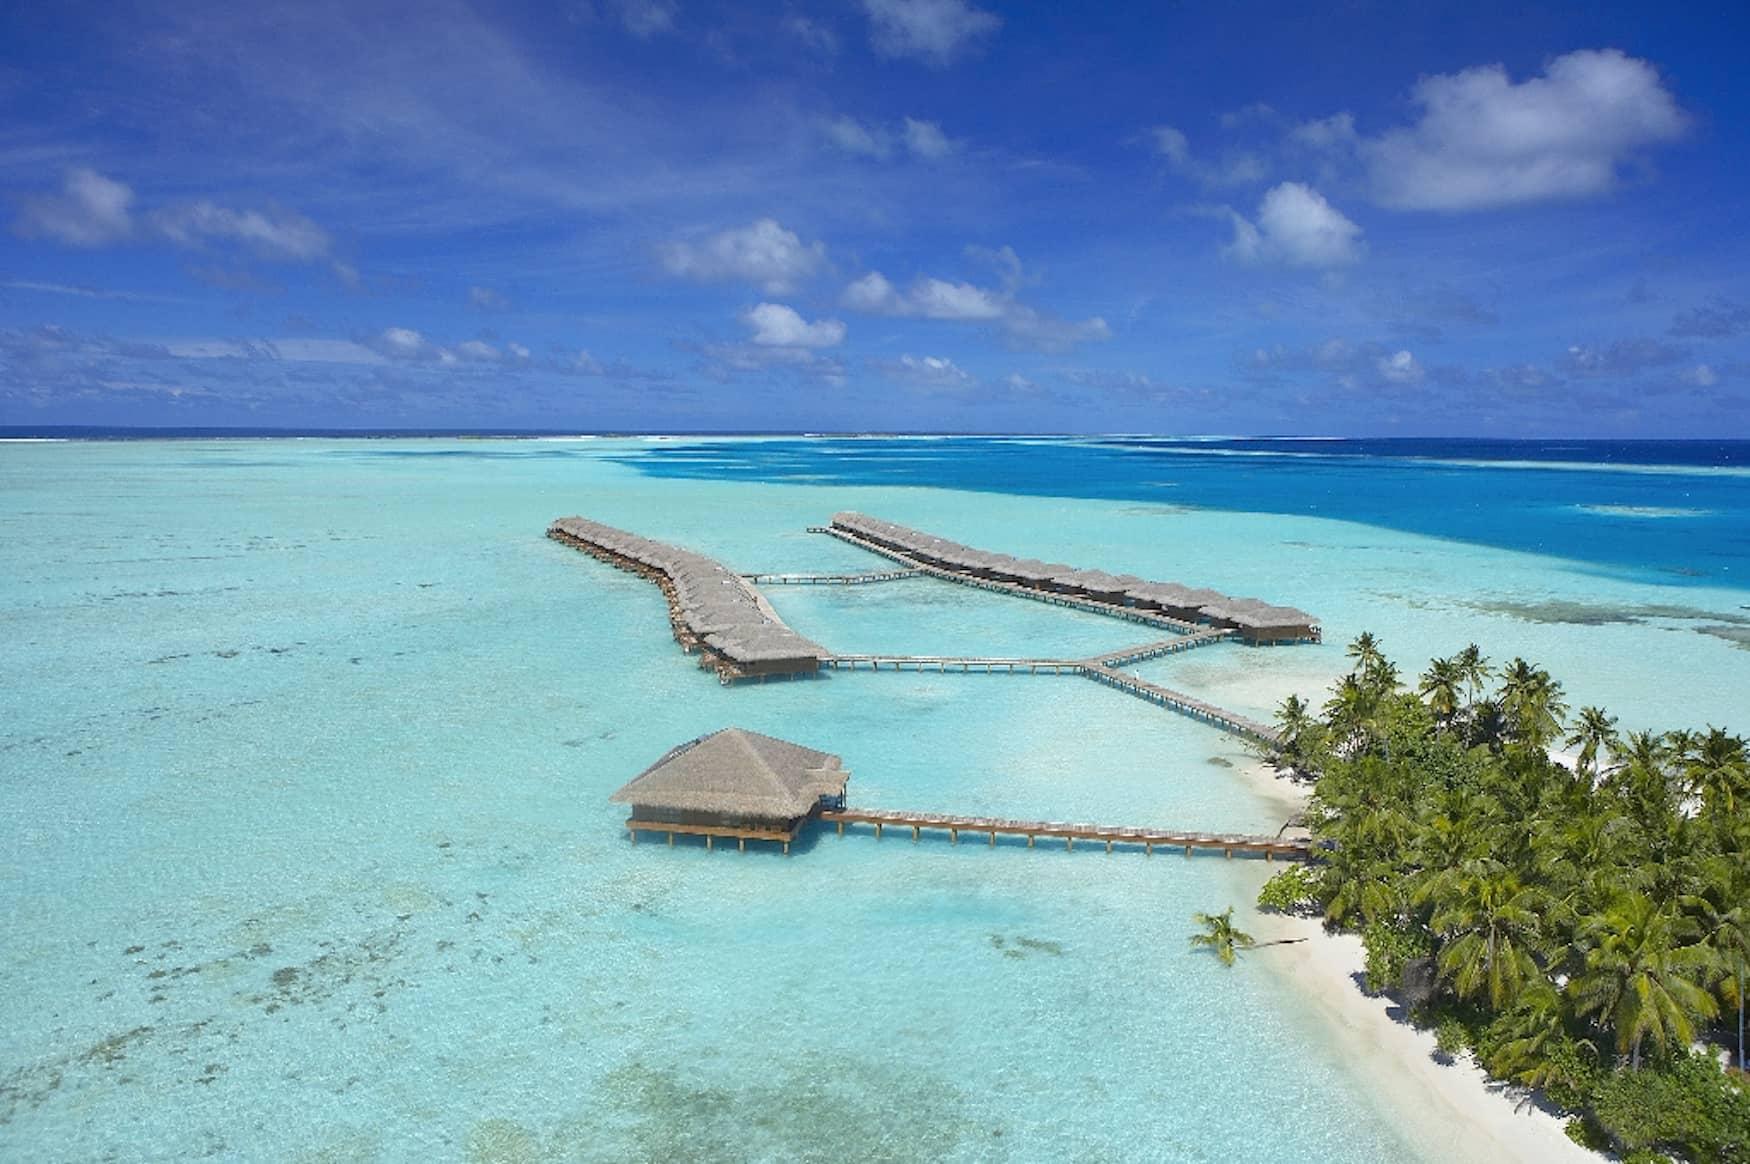 Medhufushi Island – Meemu Atoll, resort viaggio di nozze